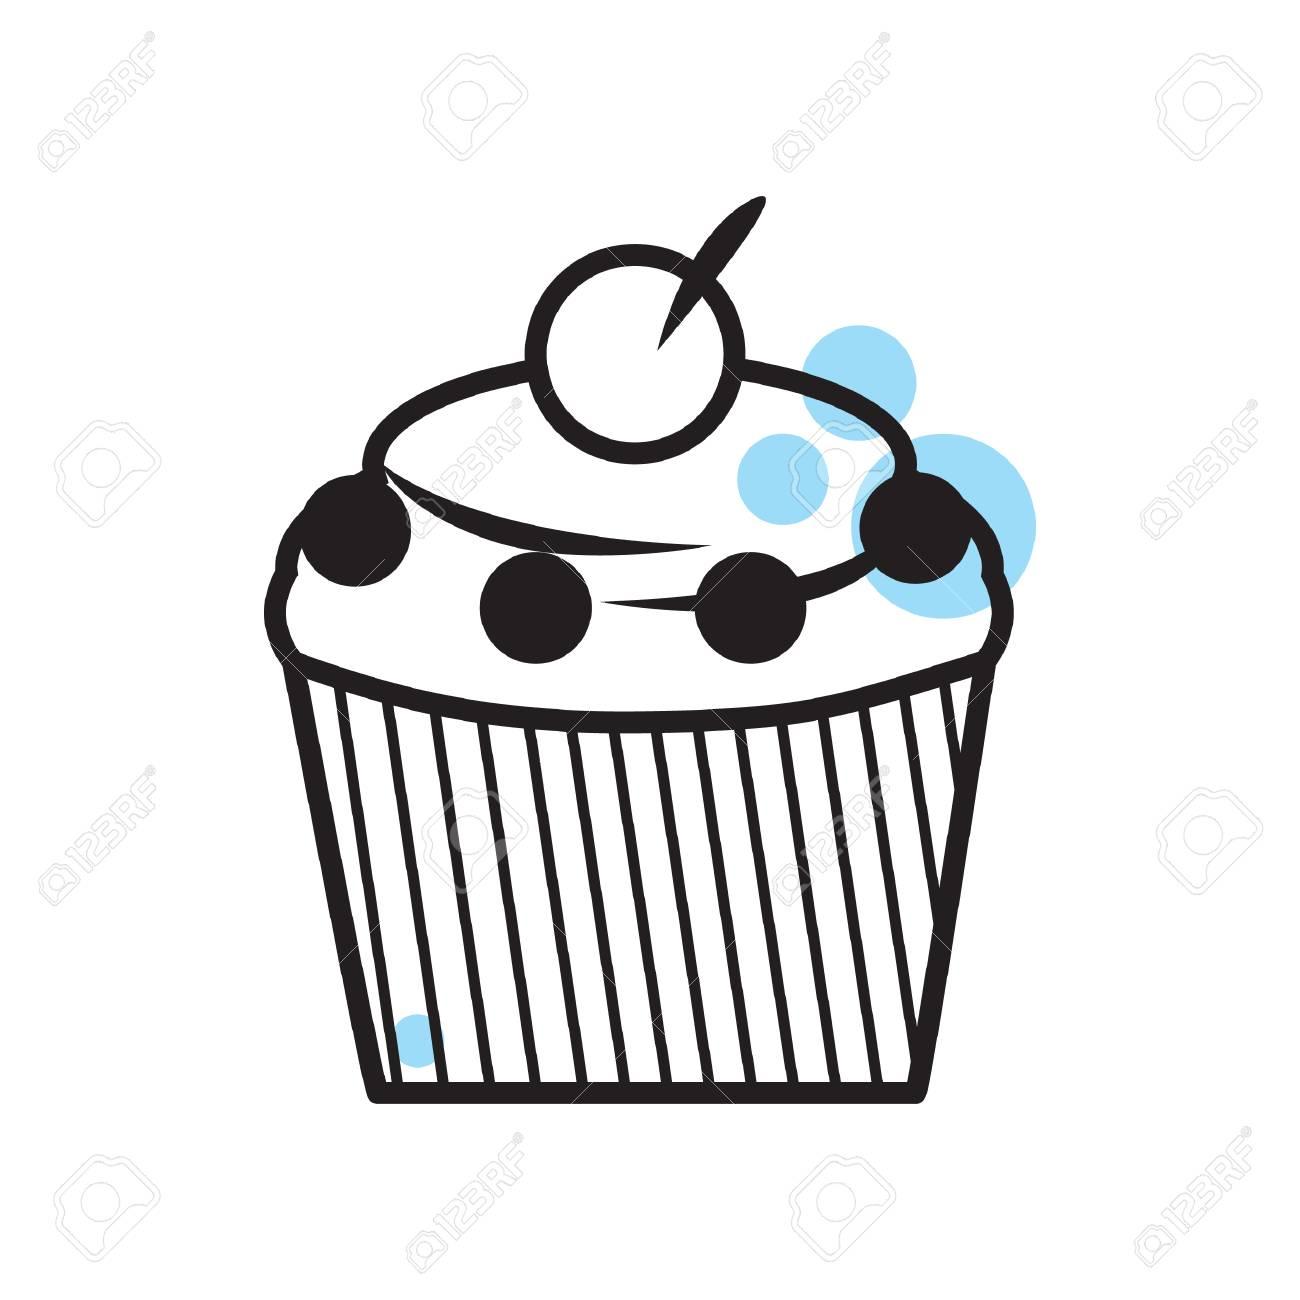 cupcake - 81590100